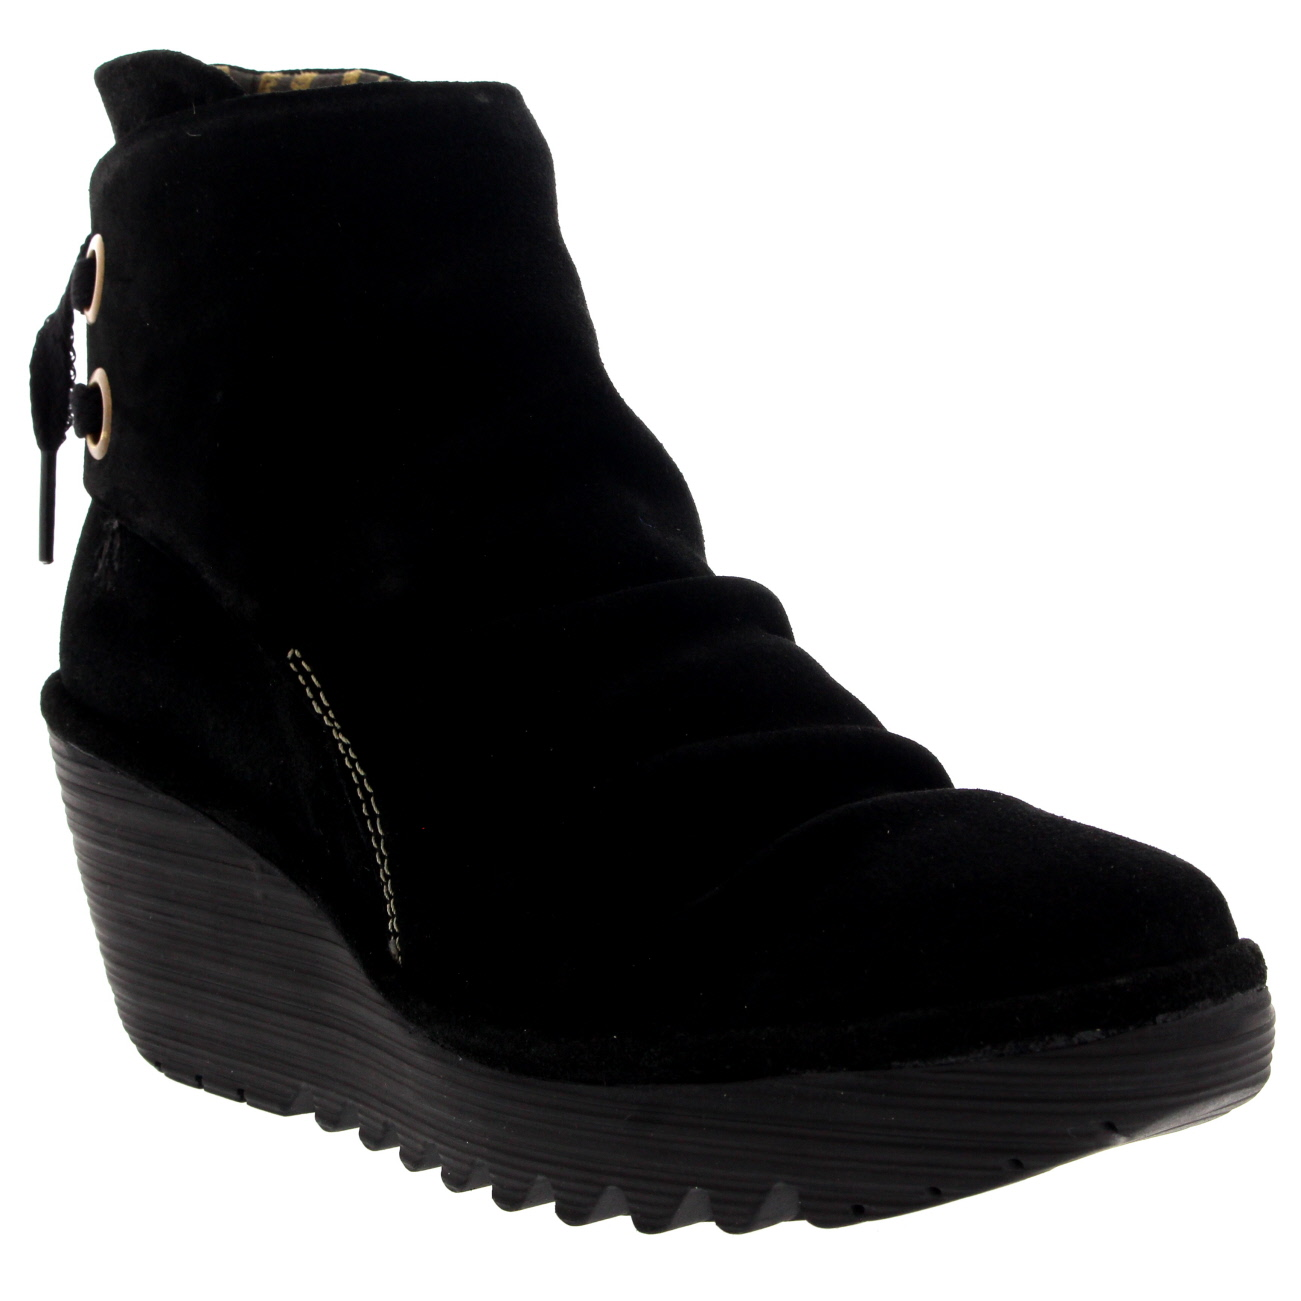 Wedge Heel Winter Ankle Boots UK